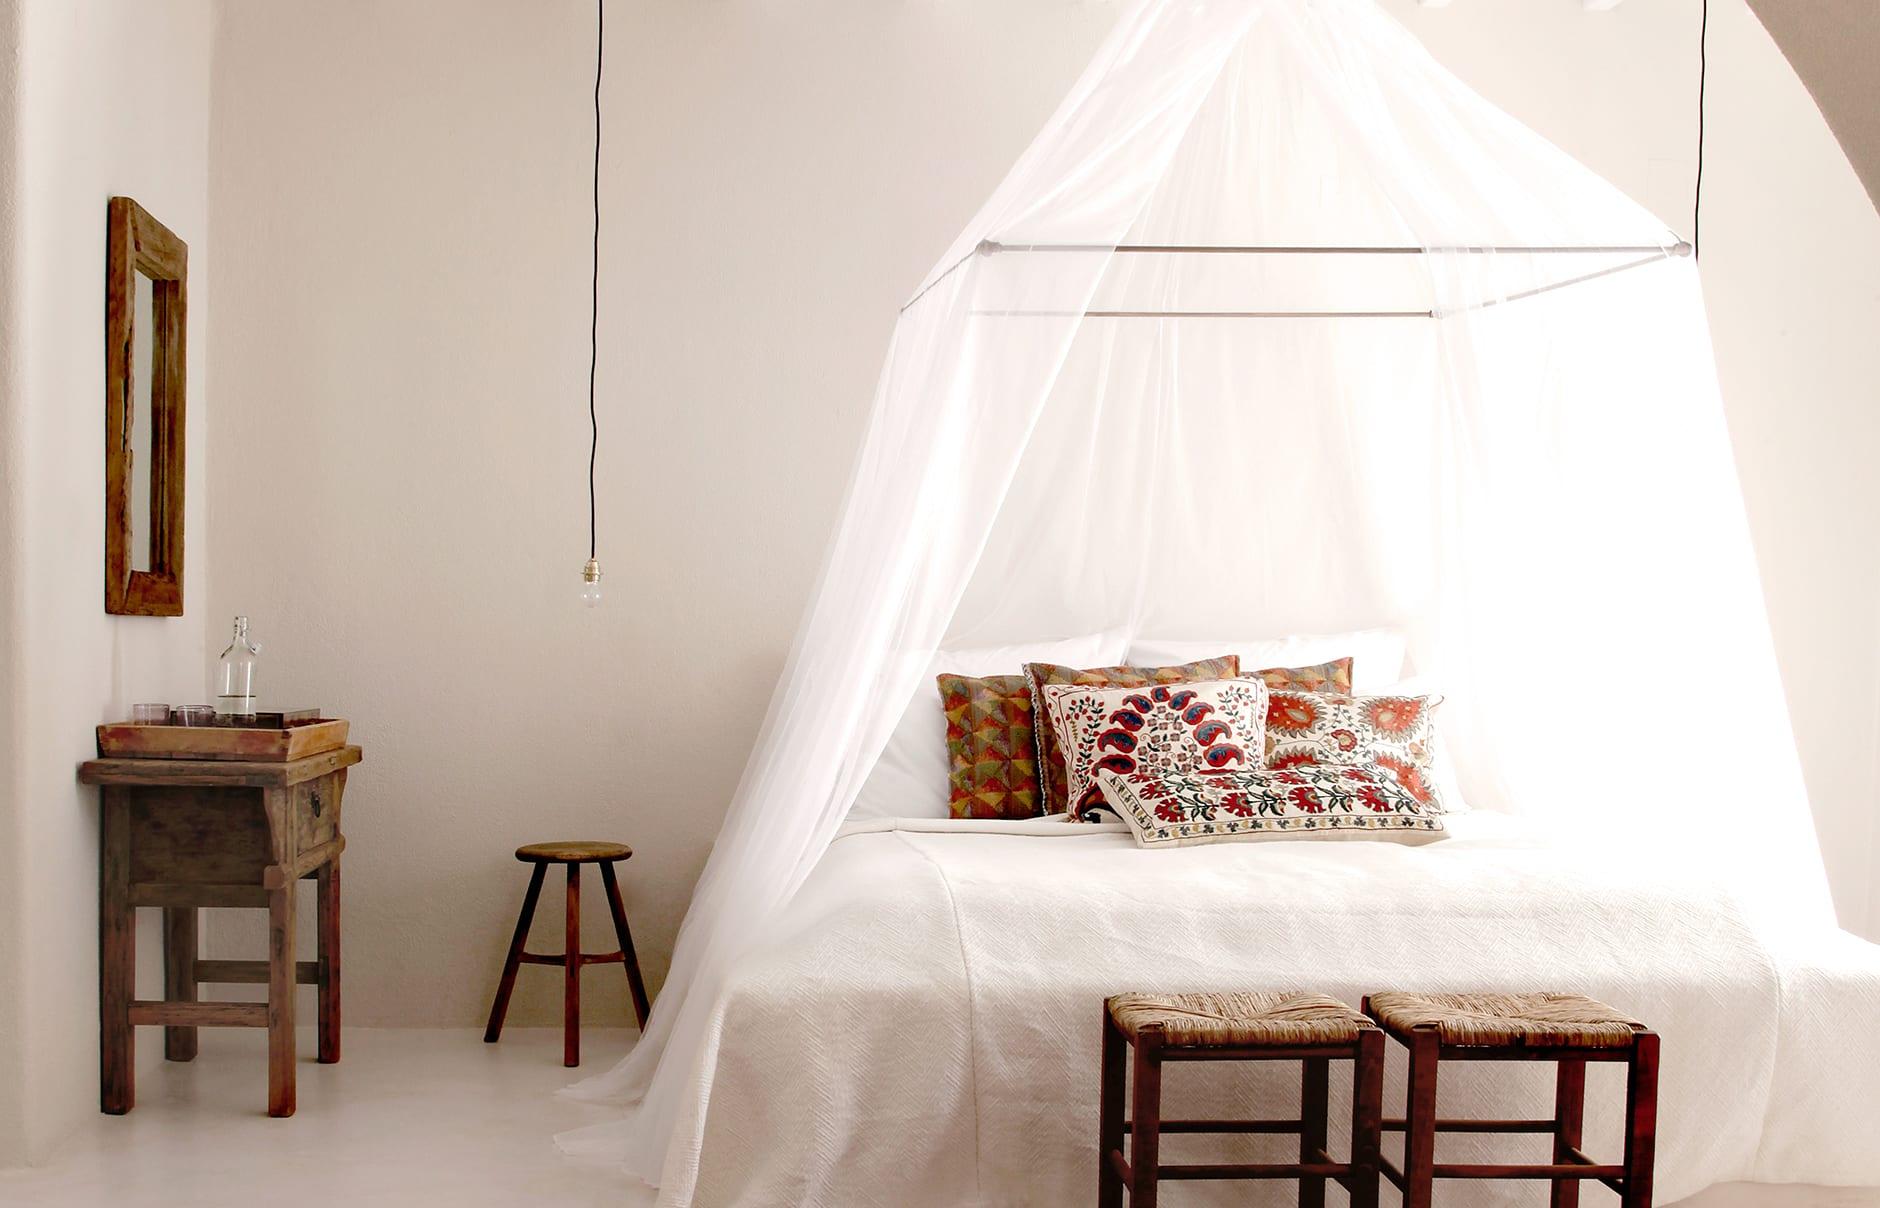 Famosa Suite. San Giorgio Mykonos a Design Hotels™ Project, Greece. © SAN GIORGIO